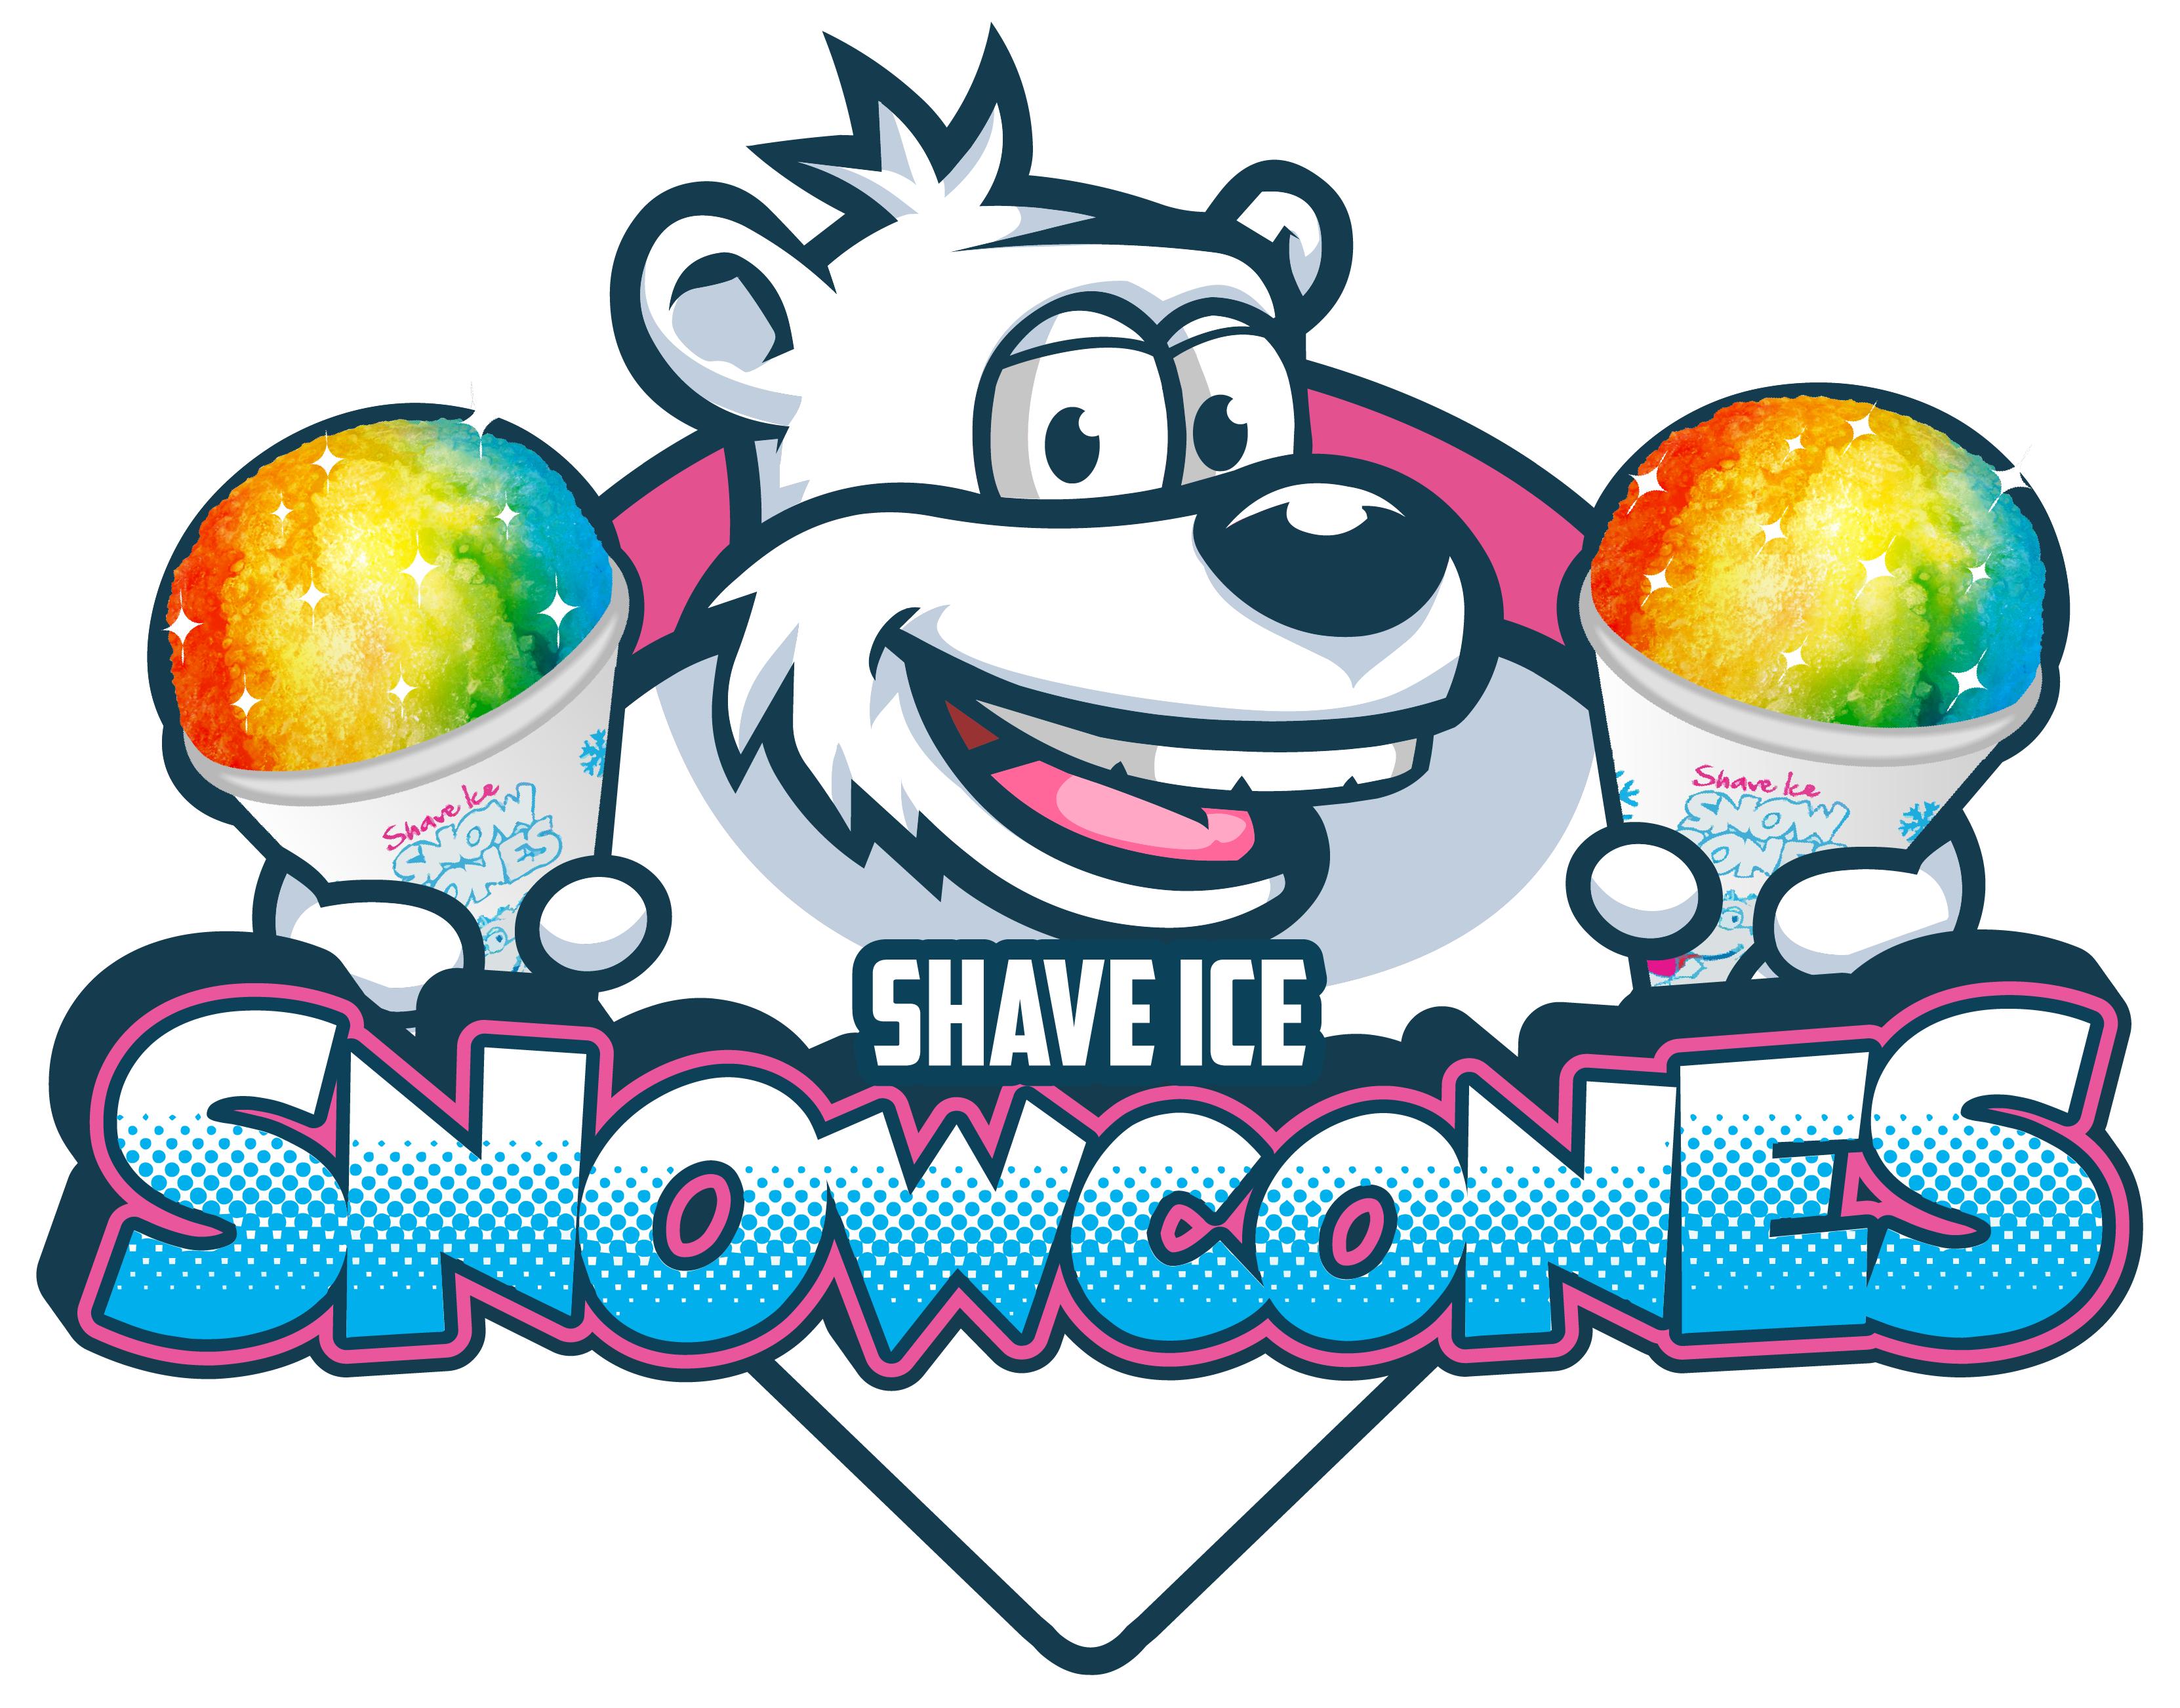 Snow cones ebay shops. Ice clipart slush puppy